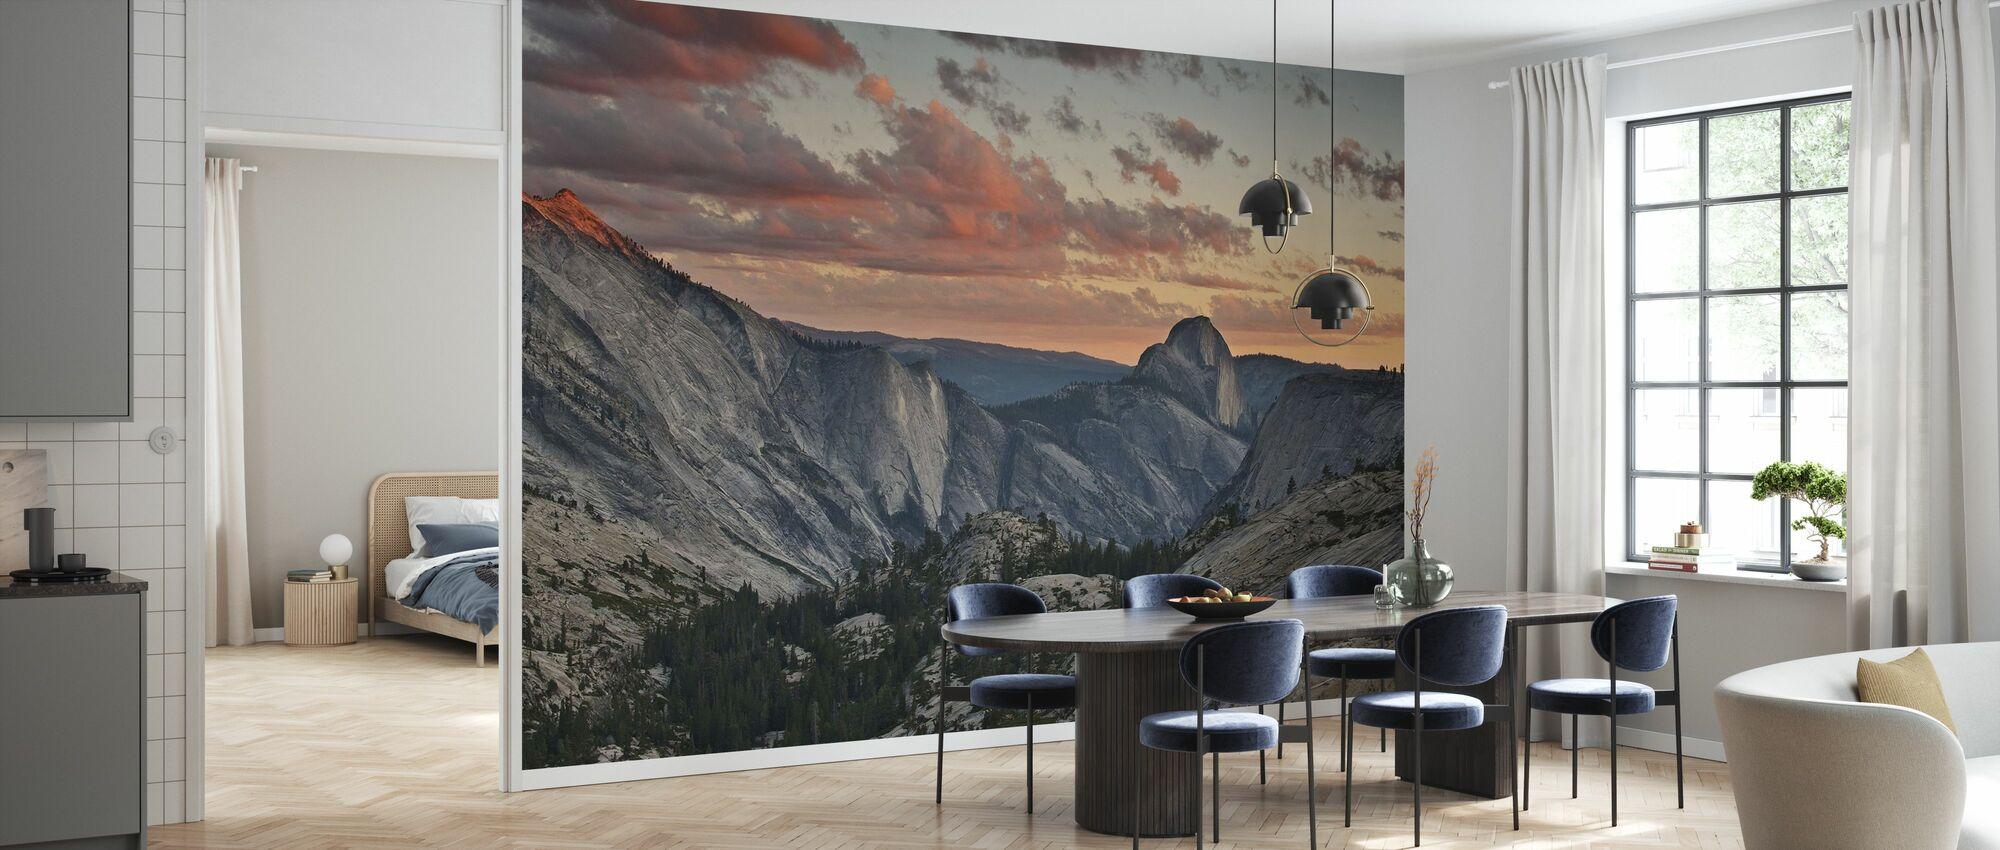 Yosemite Scenery - Wallpaper - Kitchen